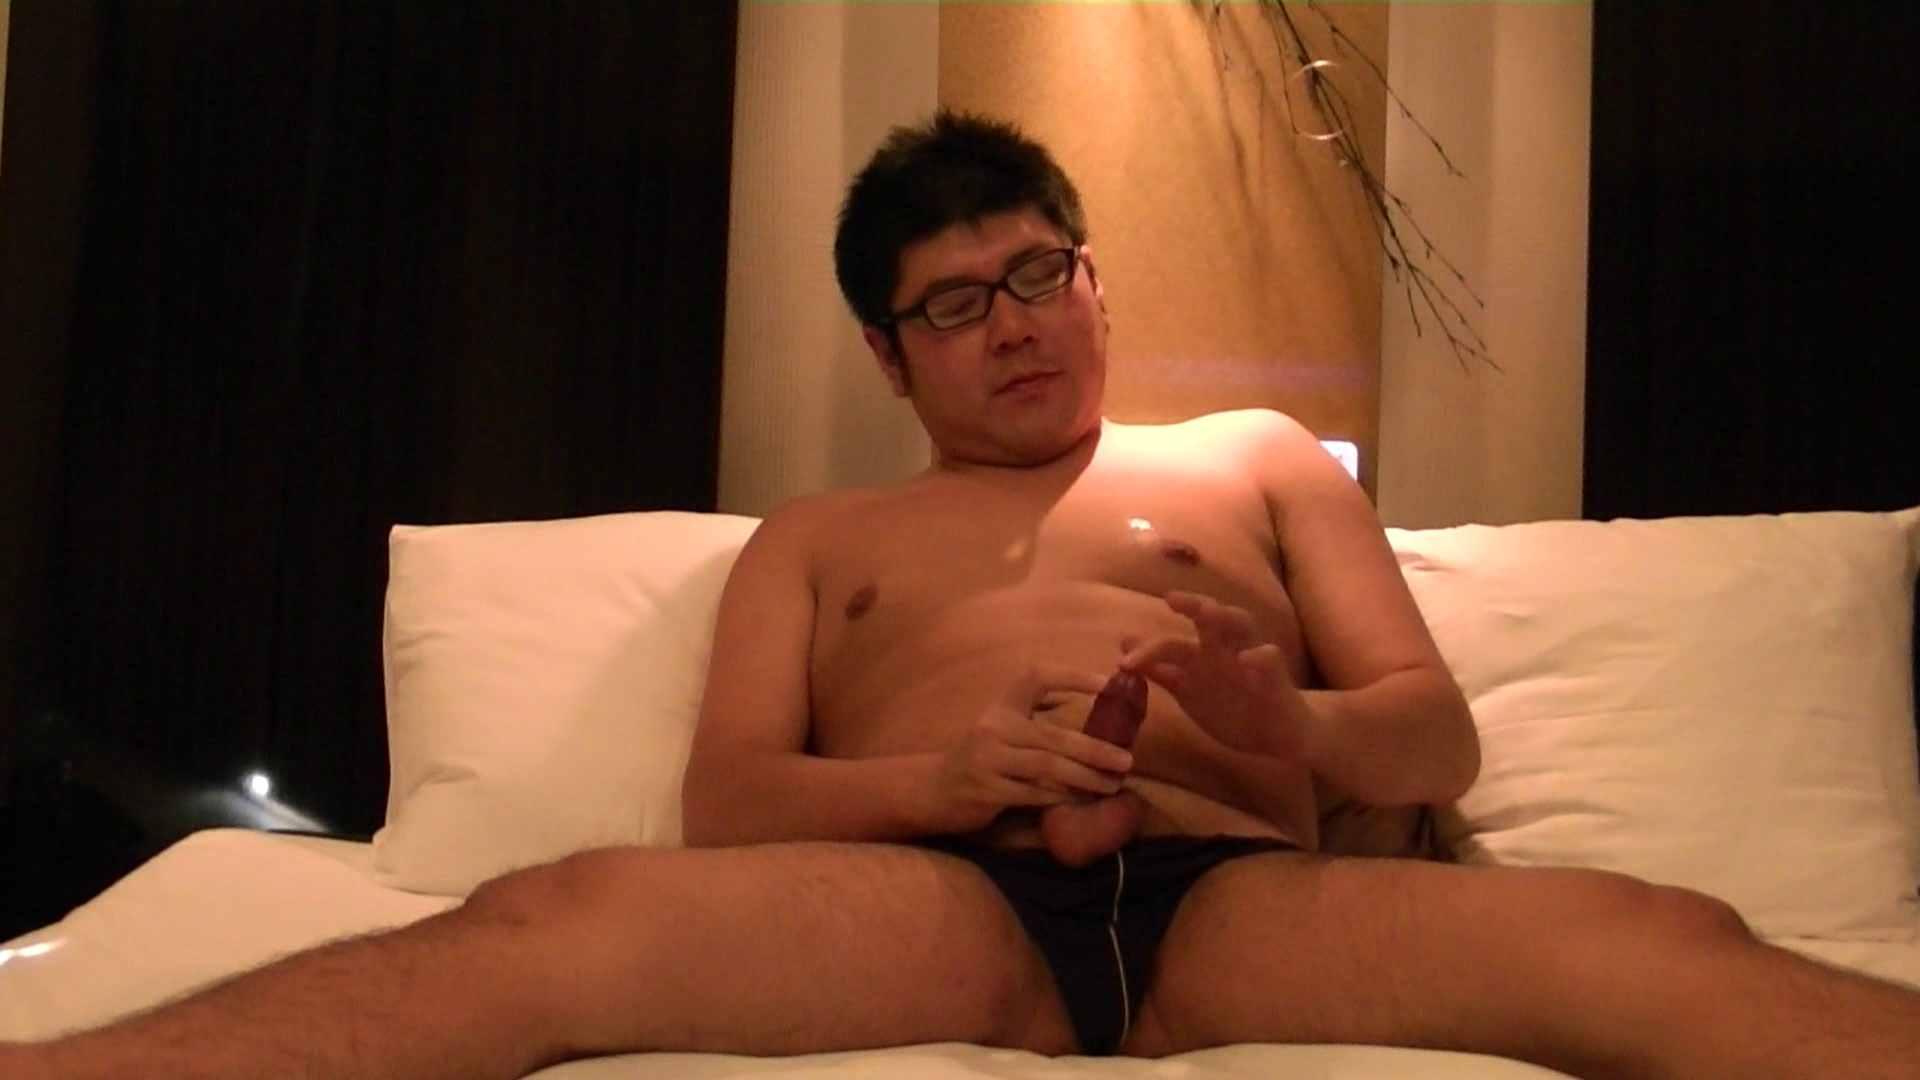 Mr.オナックスさん投稿!HD 貴方のオナニー三万円で撮影させてください。VOL.02 前編 投稿シリーズ ゲイアダルトビデオ画像 105連発 68